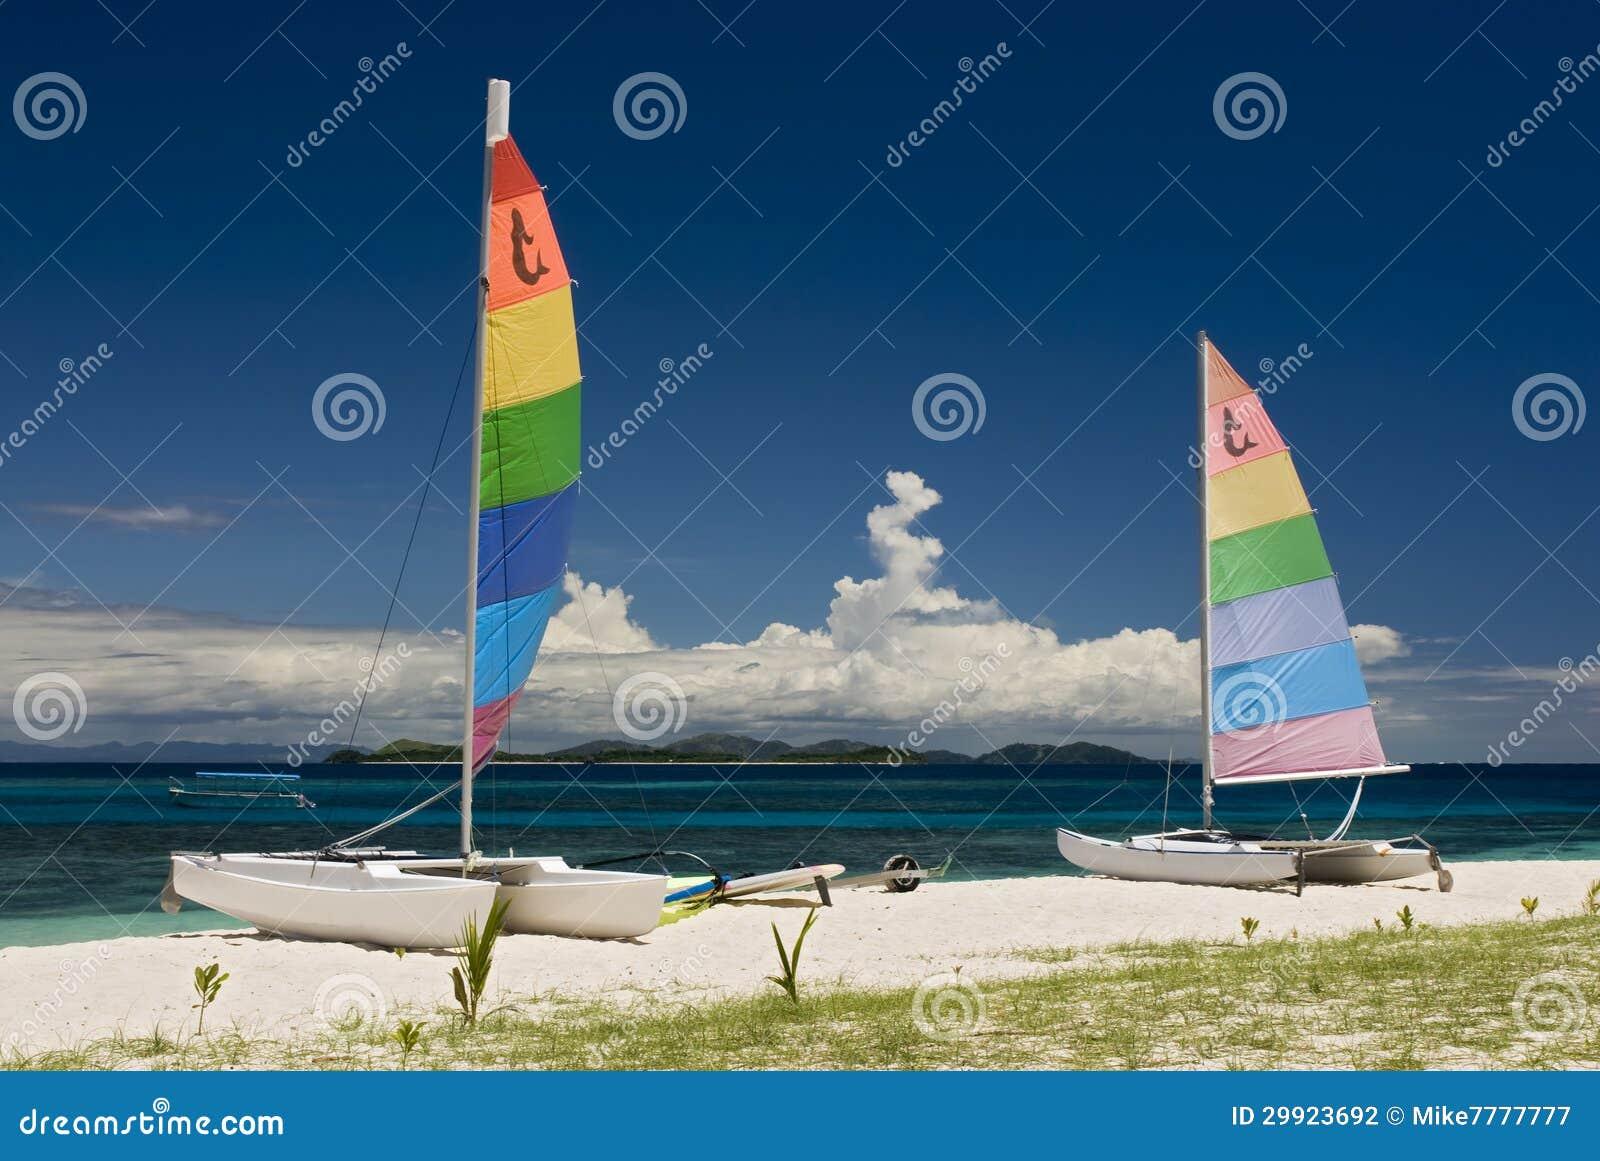 Katamaran auf sandigem Strand, Fidschi